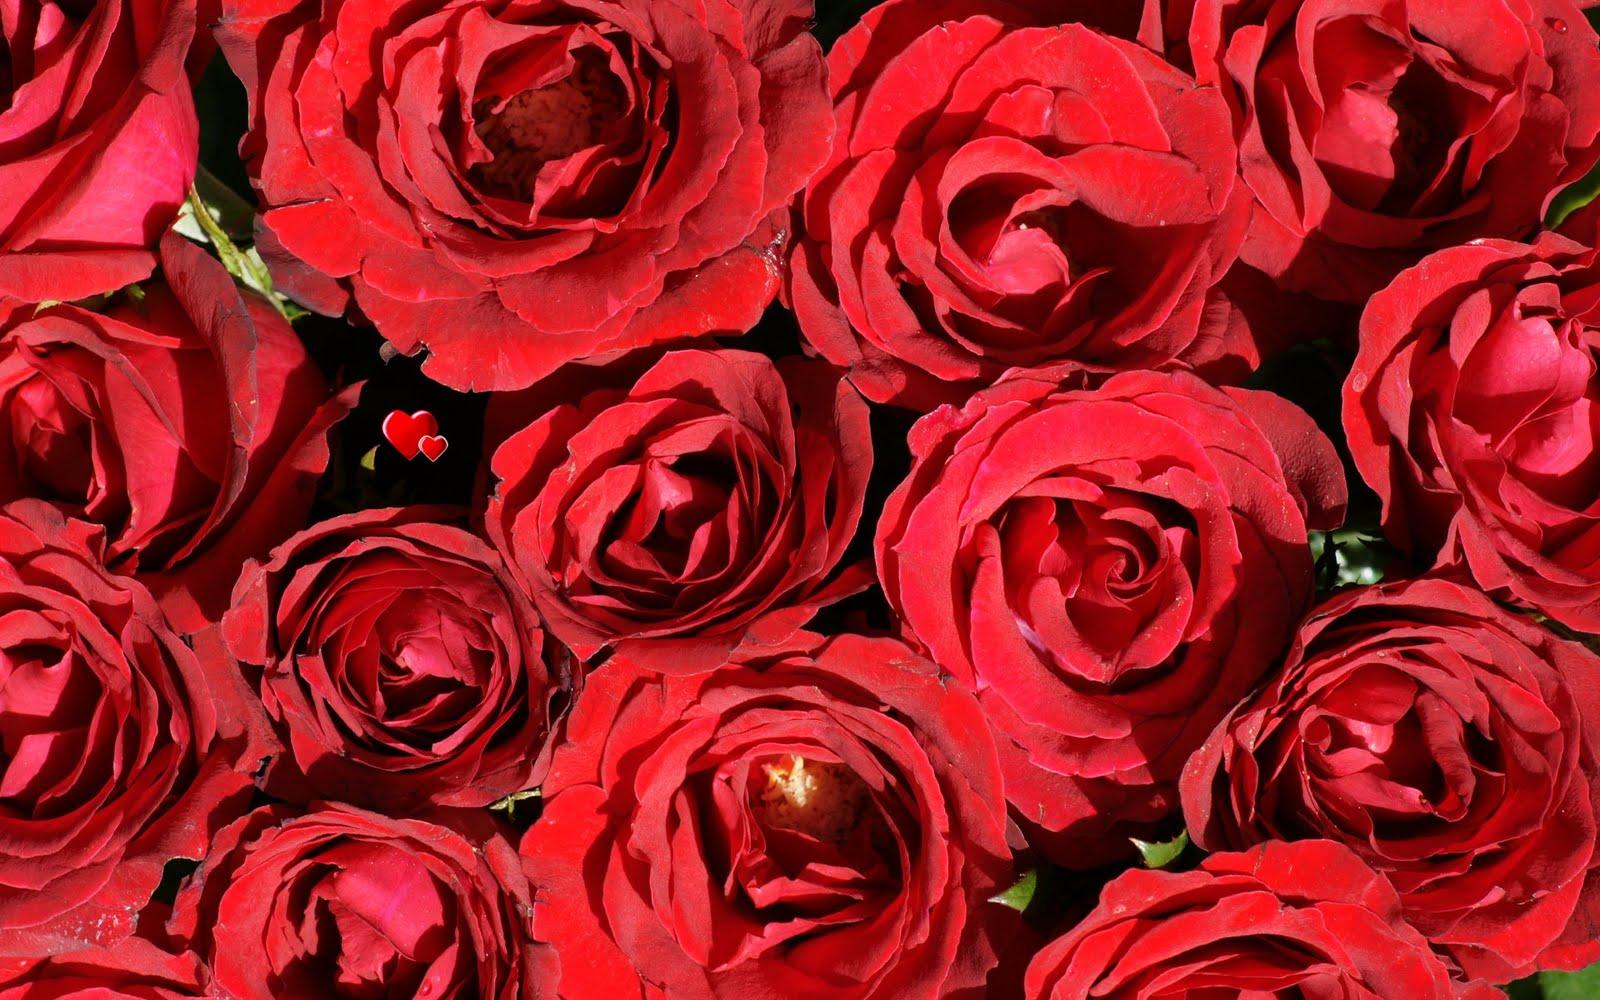 http://2.bp.blogspot.com/_BEyQraI-KQQ/SxSxTchaUfI/AAAAAAAADuM/MrWD9oz9qWI/s1600/beautiful-red-roses-dsc03595-ws.jpg